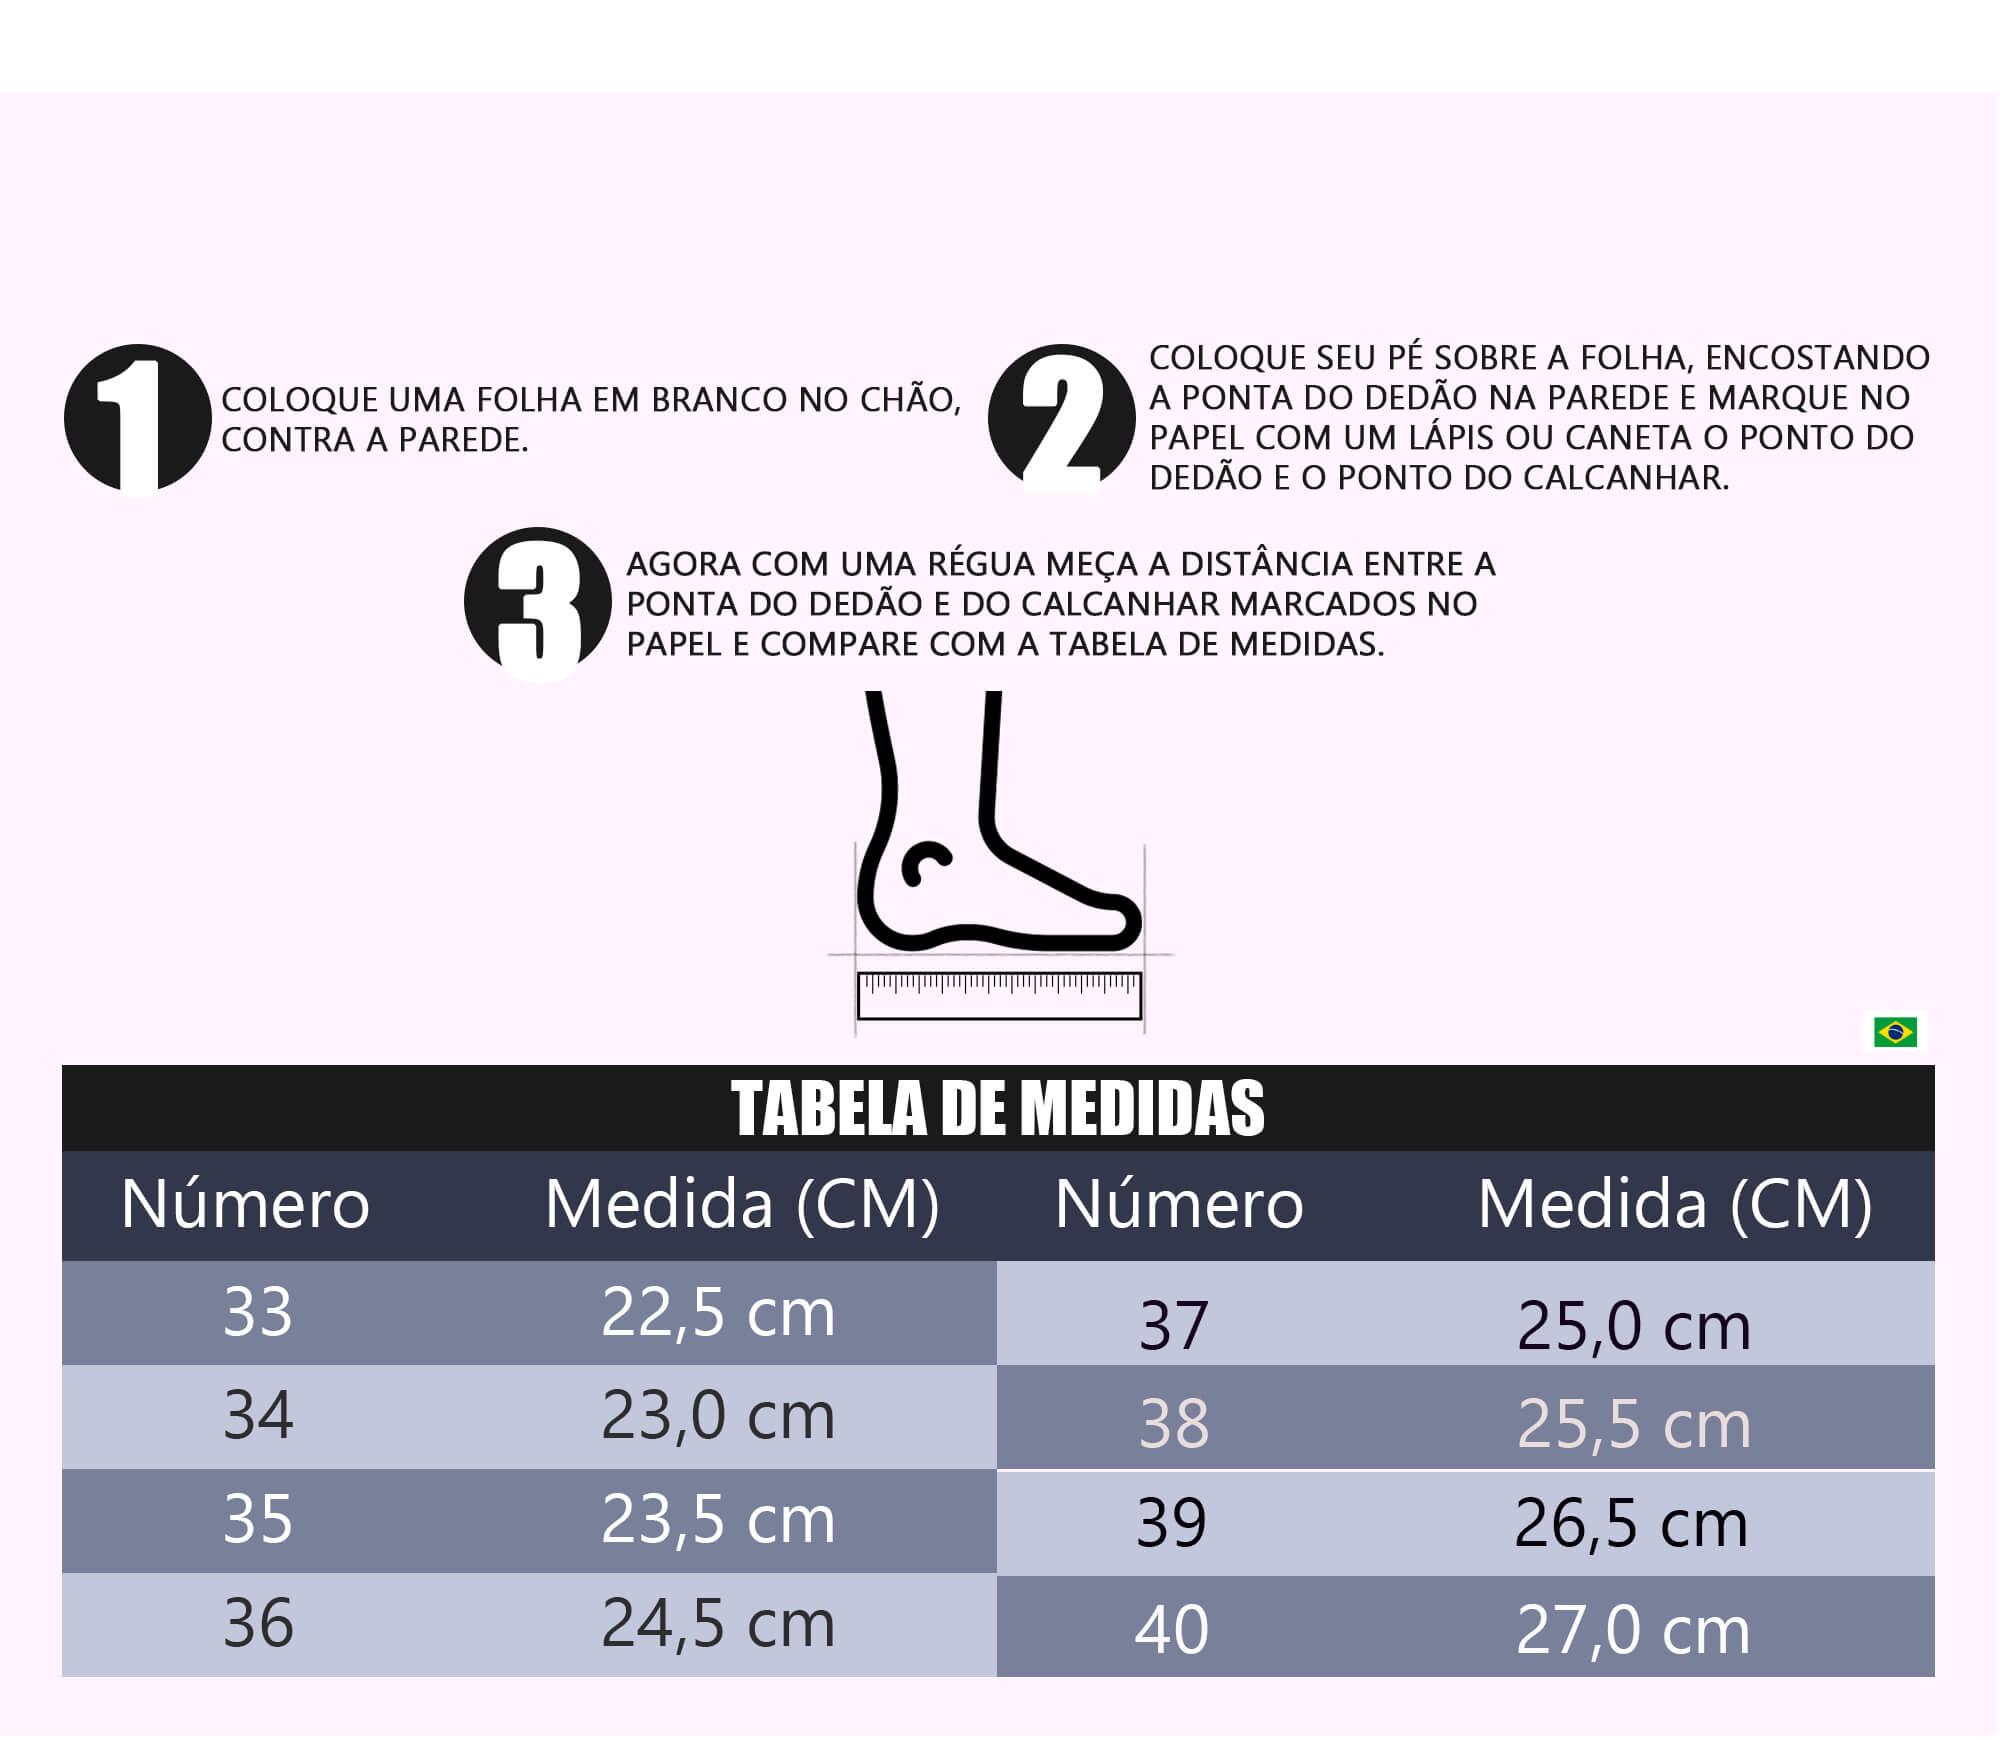 SANDÁLIA FEMININA VIZZANO ANABELA PELICA TRAMADO REF 6283200